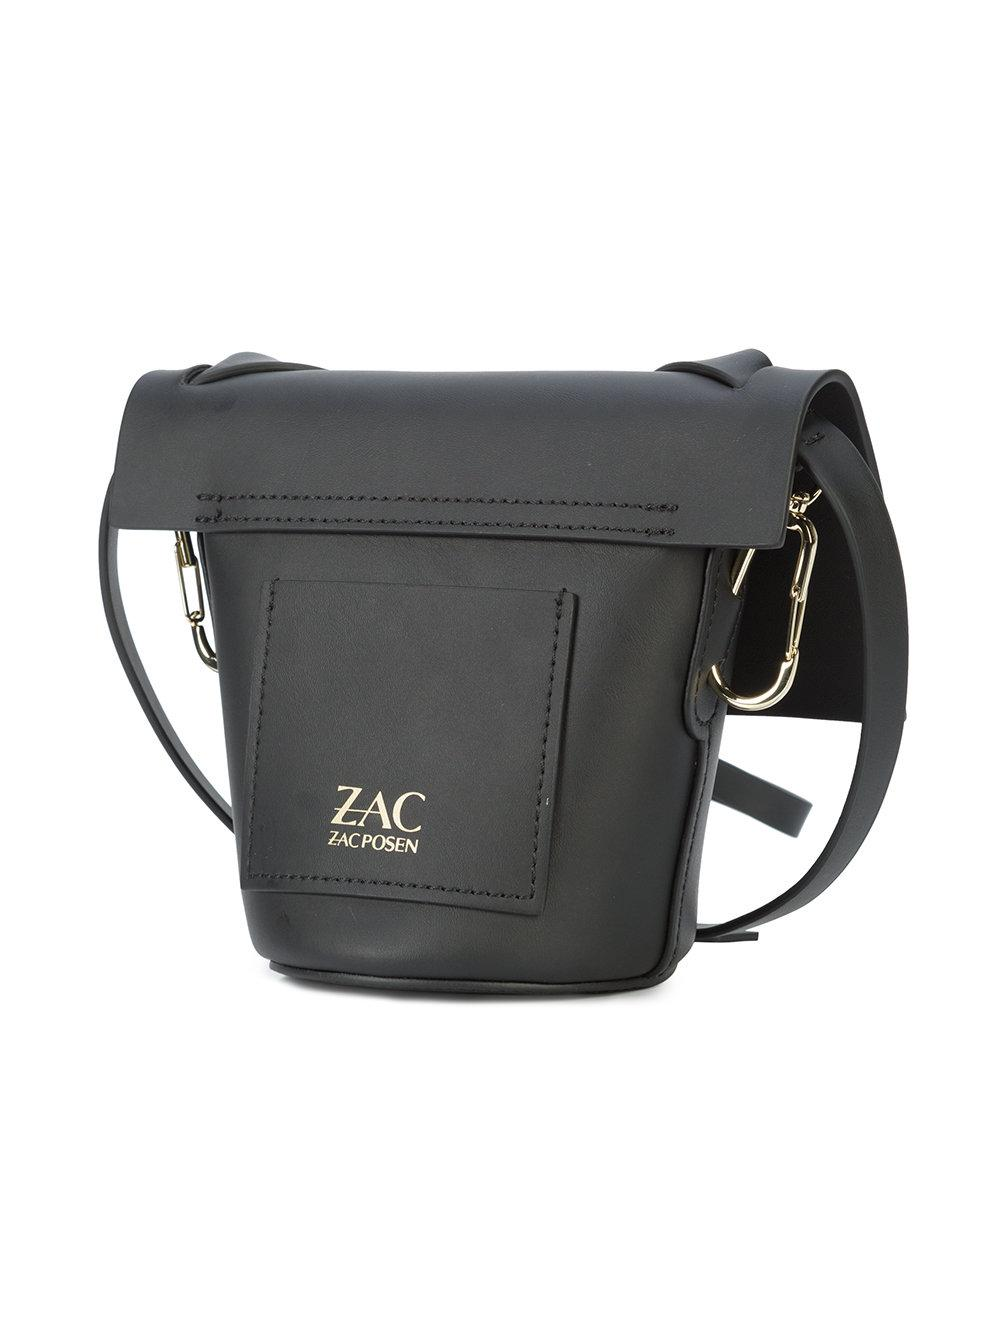 Zac Zac Posen Leather Belay Mini Crossbody Bag in Black